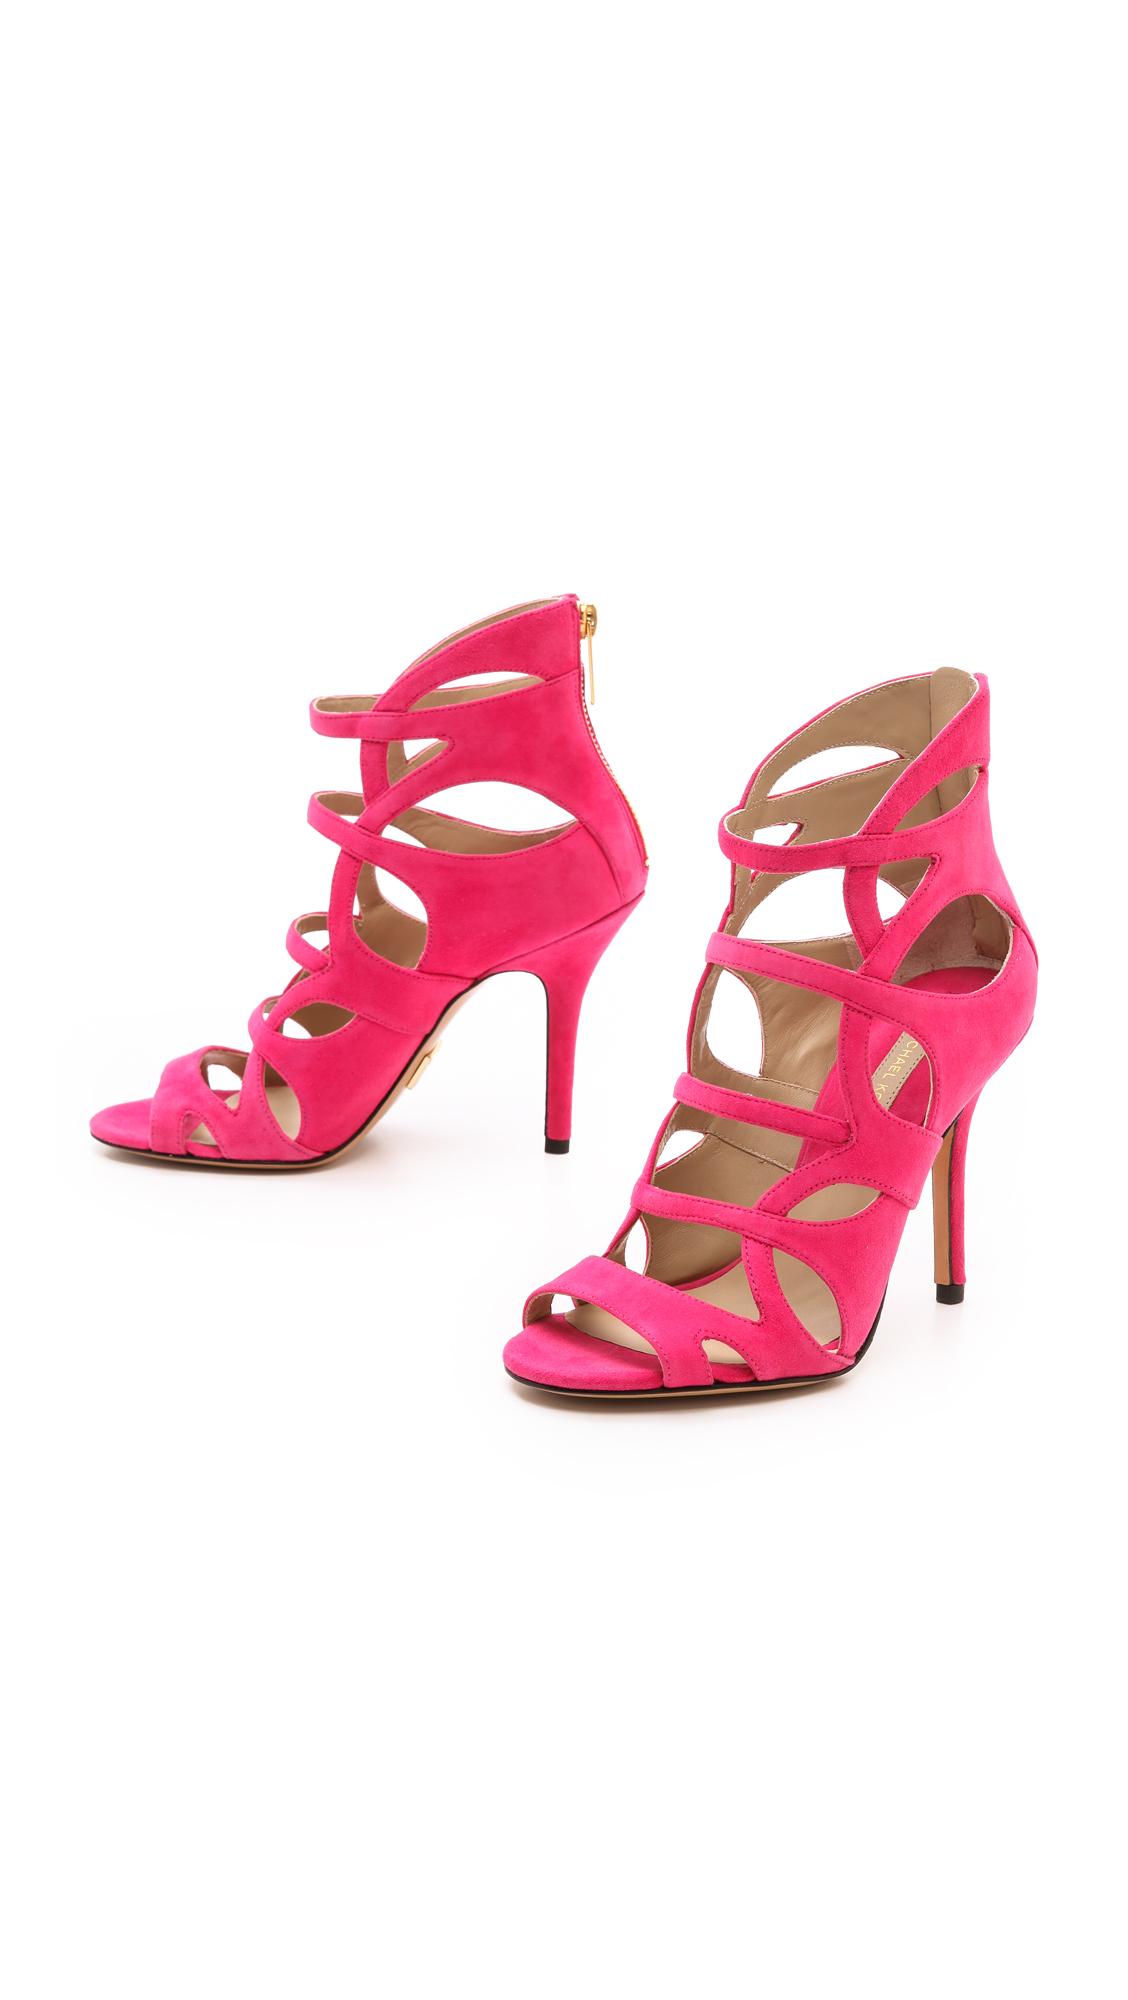 Lyst Michael Kors Casey Cutout Sandals Black In Pink